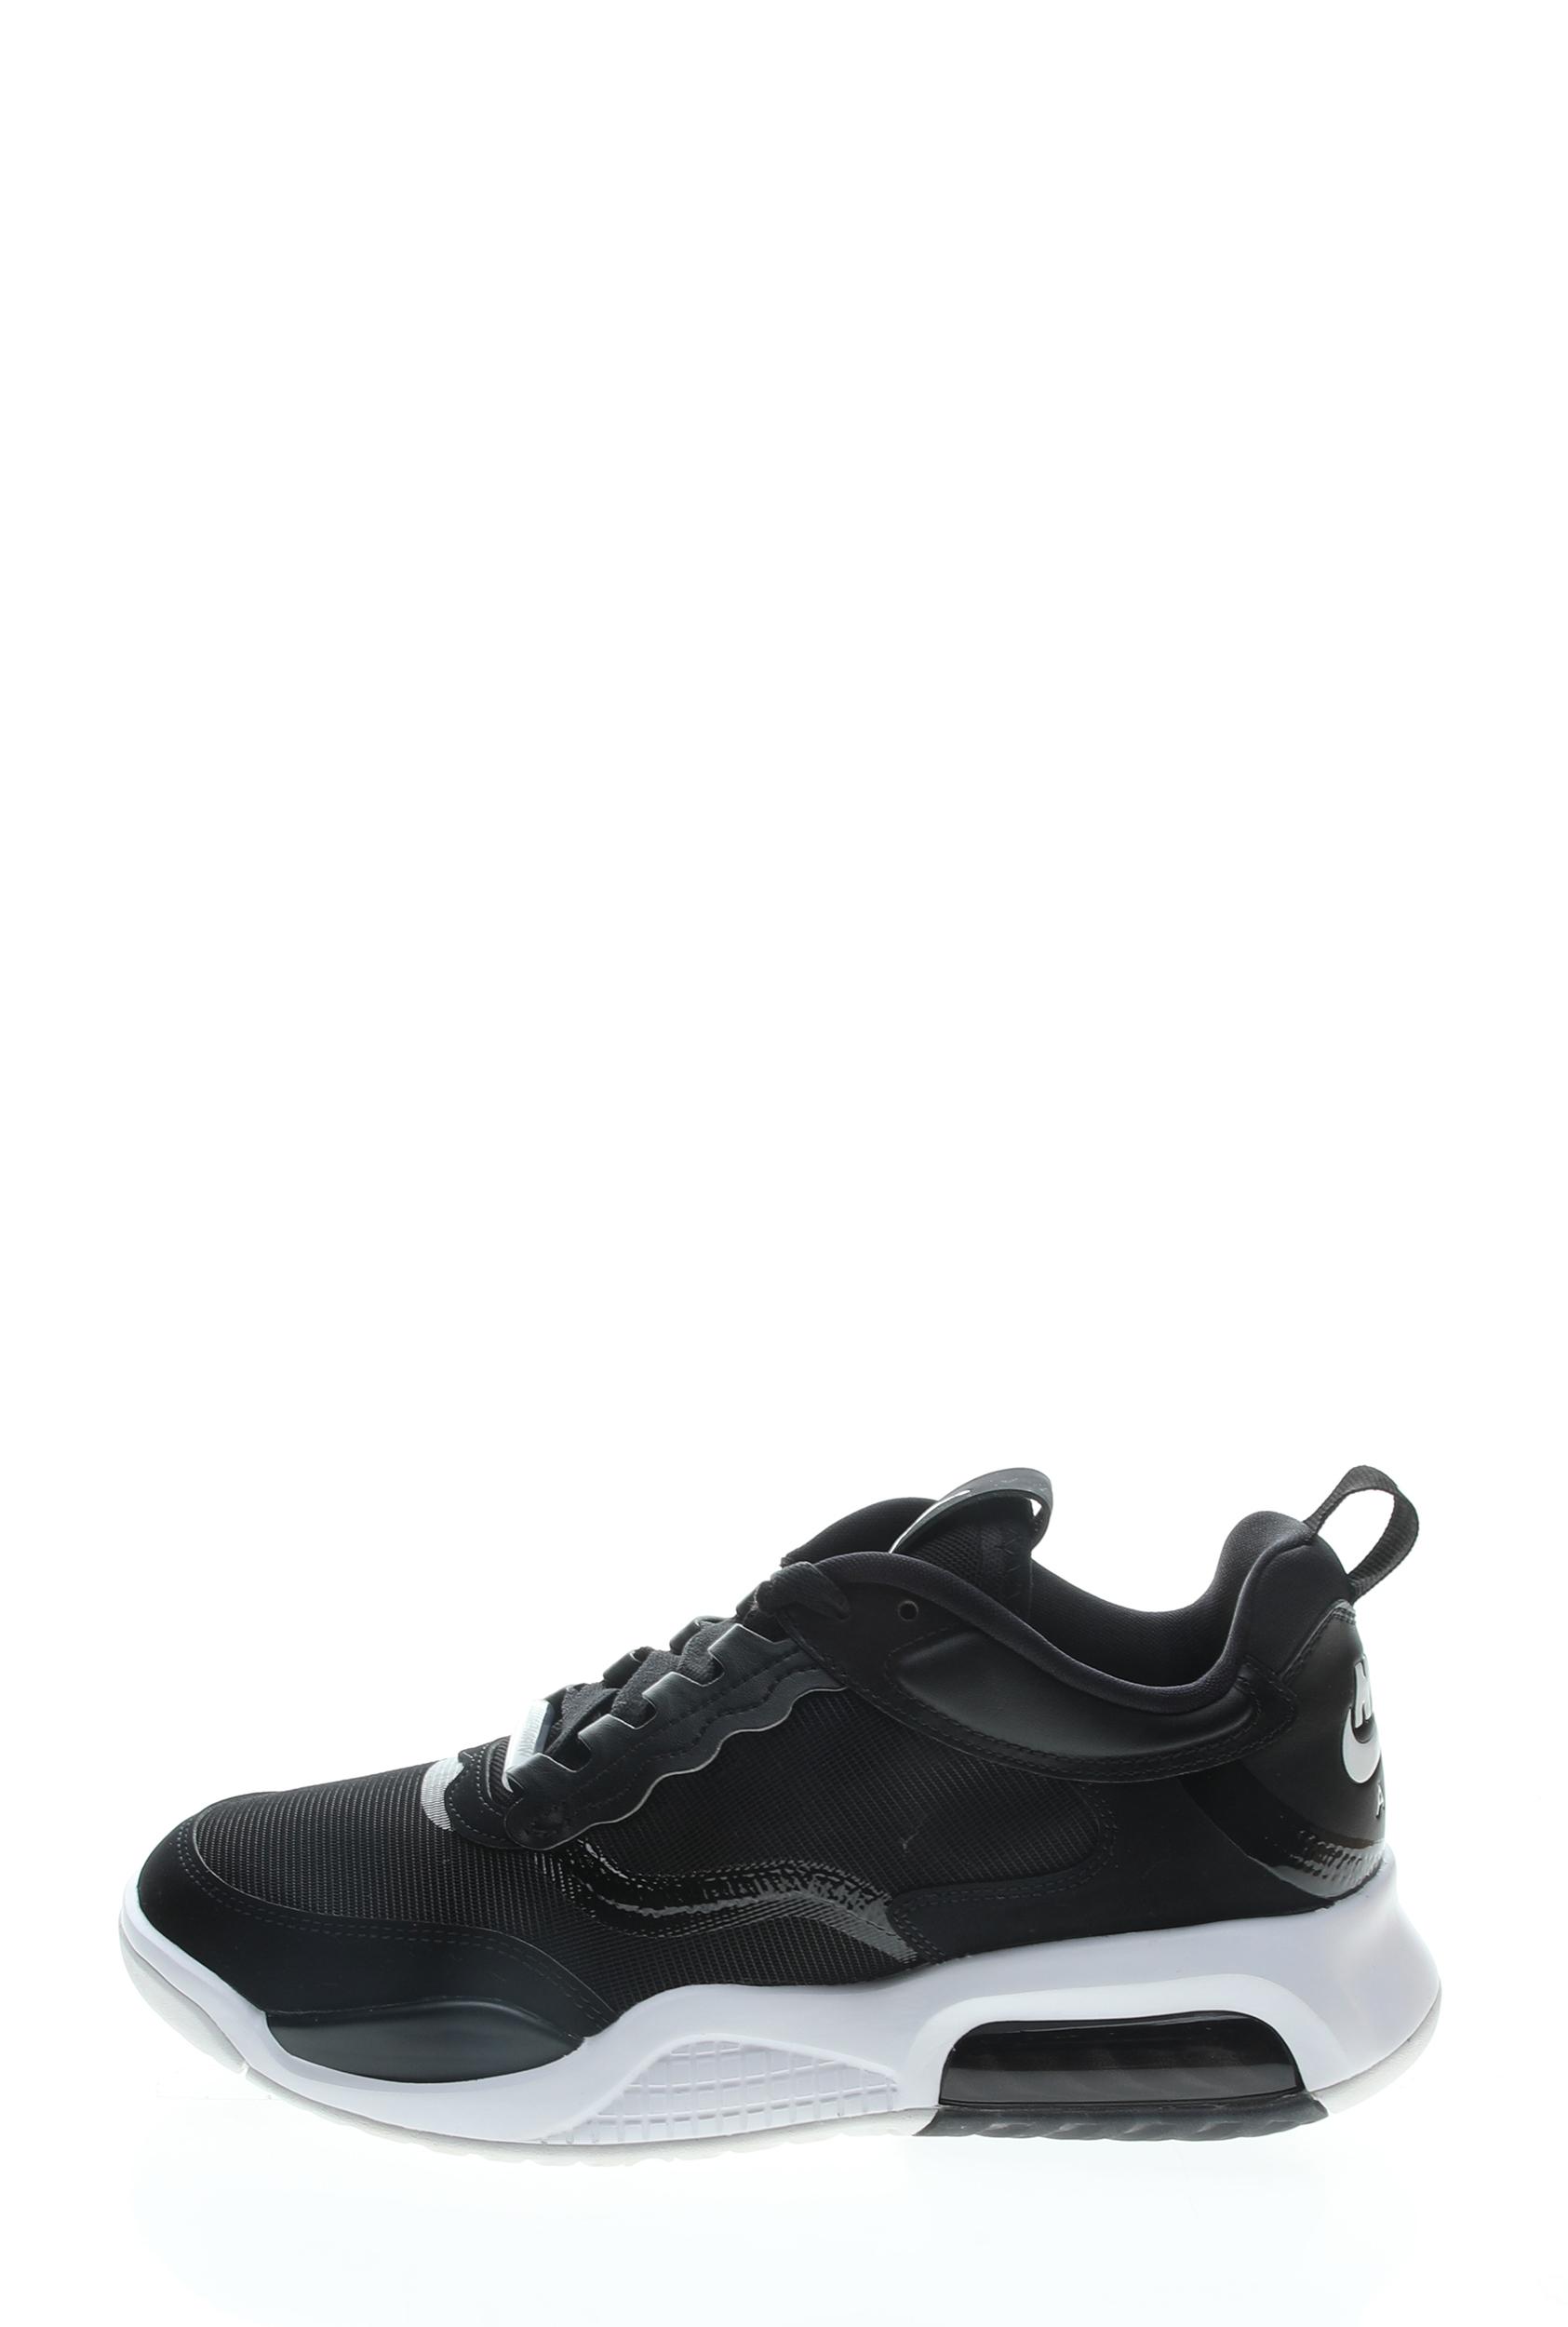 NIKE – Ανδρικά αθλητικά παπούτσια NIKE JORDAN MAX 200 μαύρα